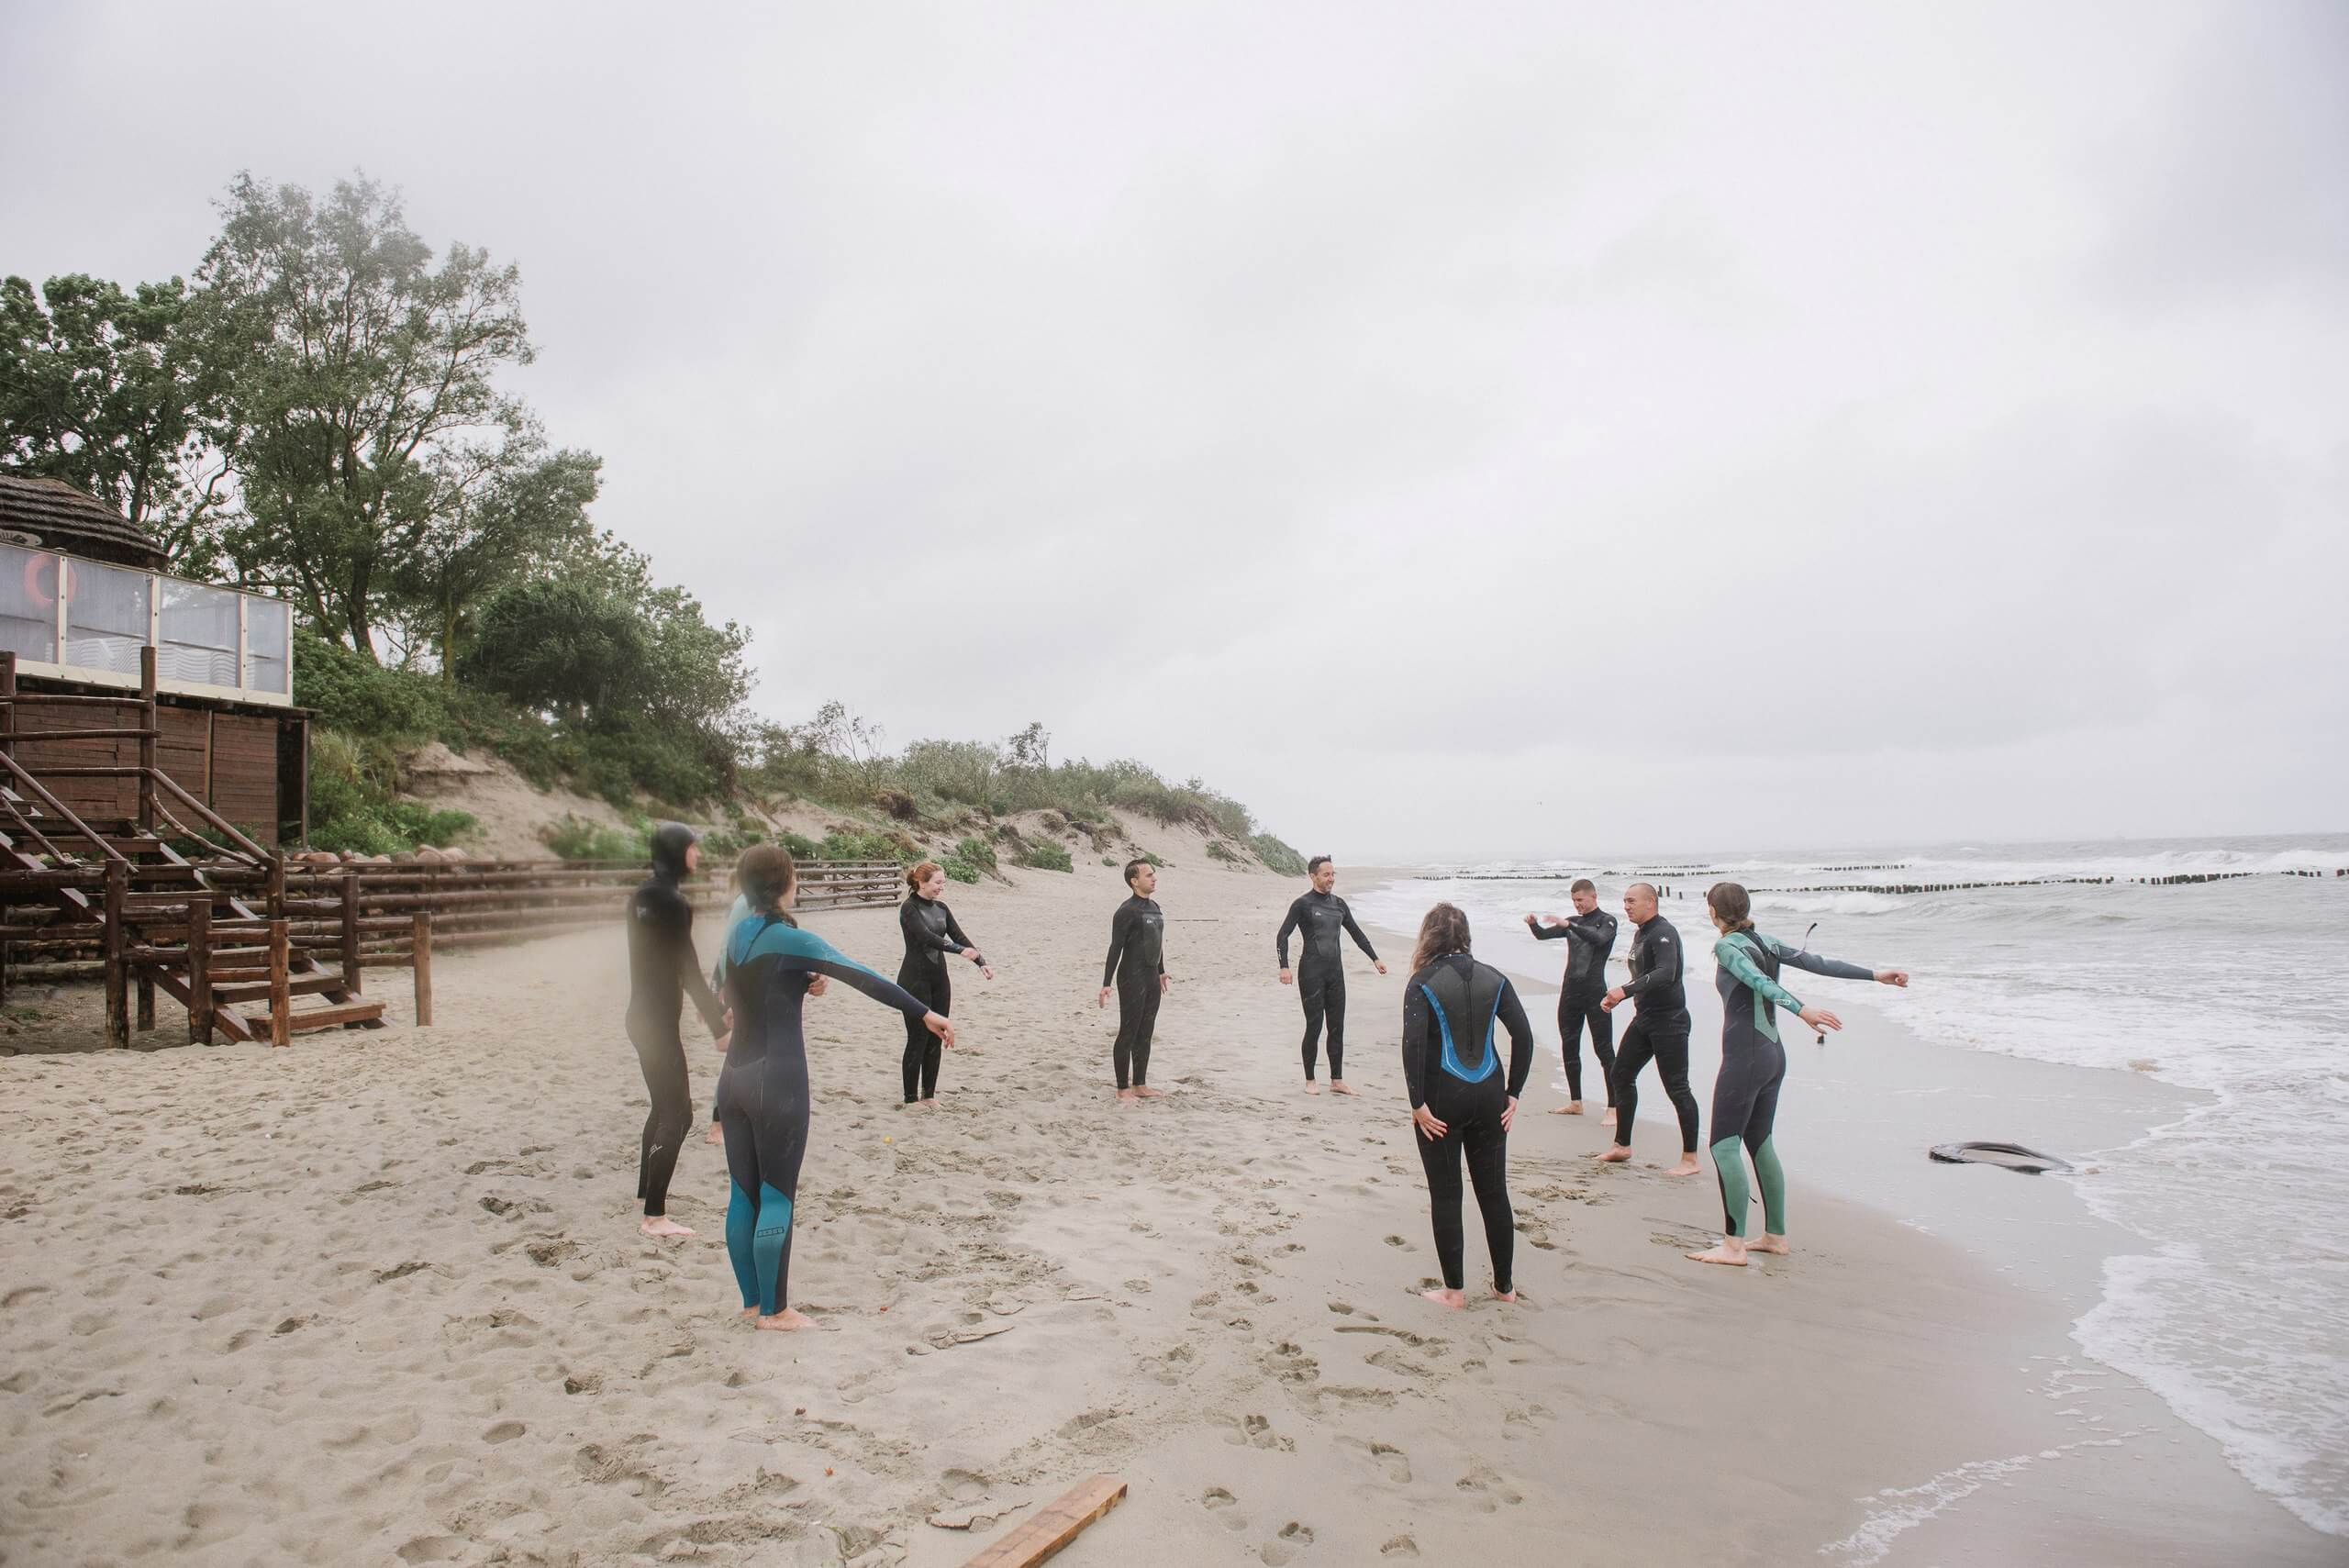 разминка перед серфингом